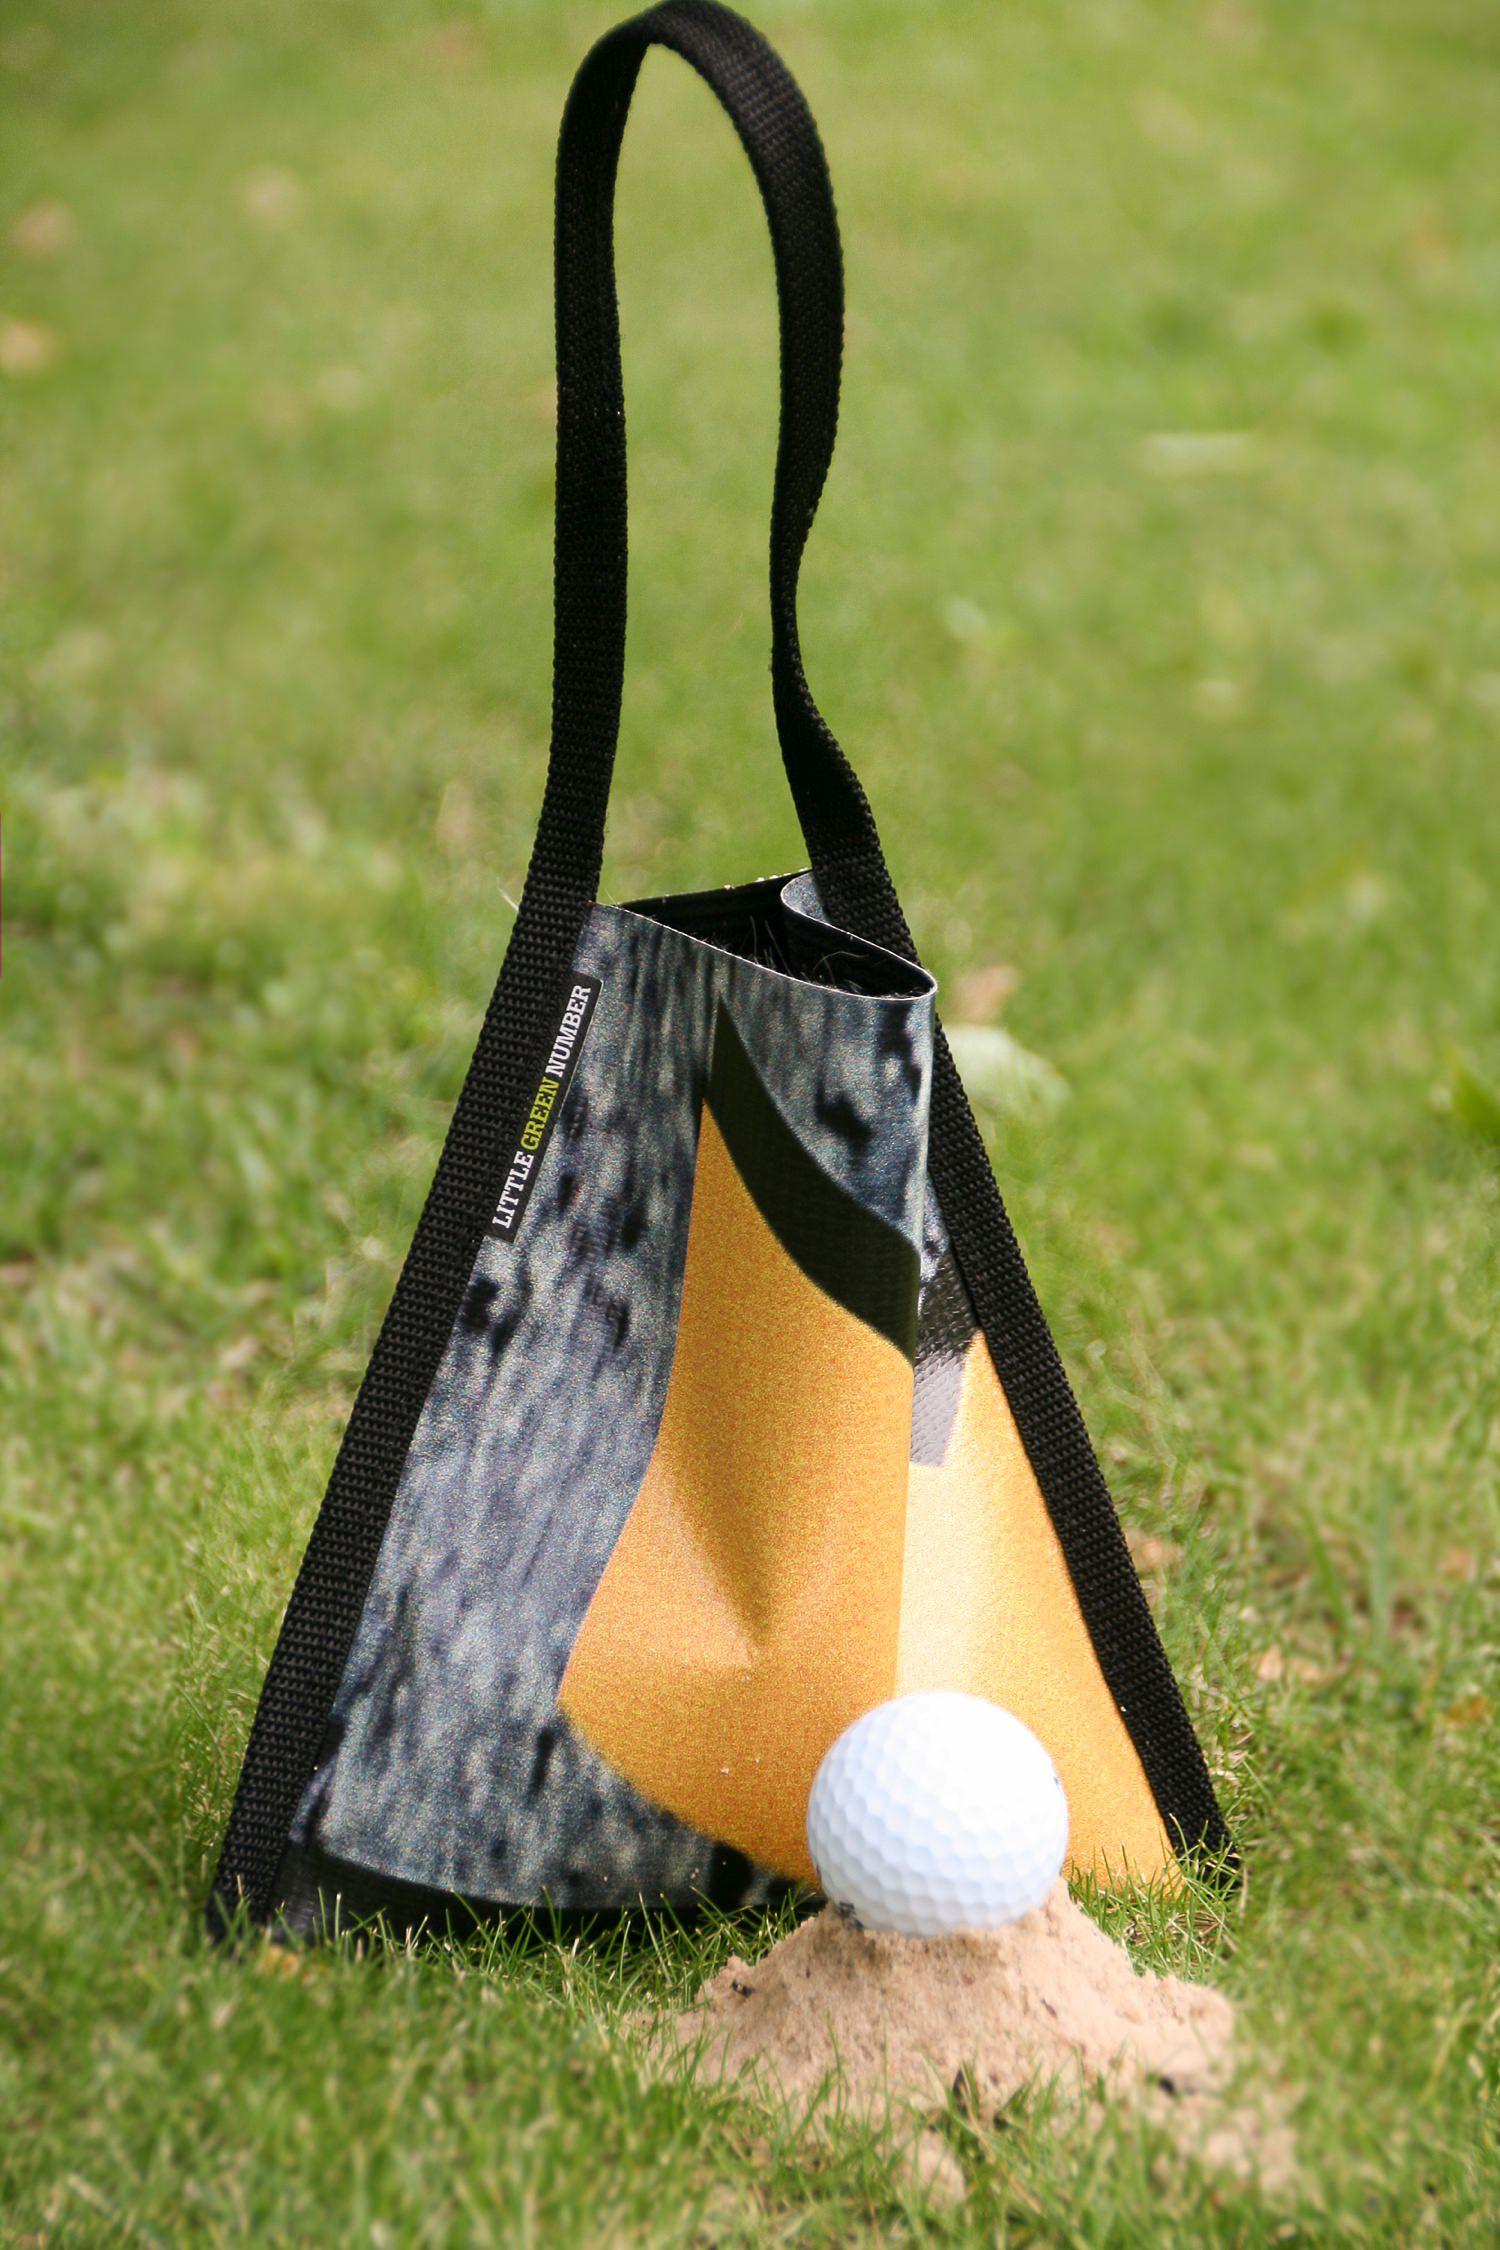 Golfer Sandbag